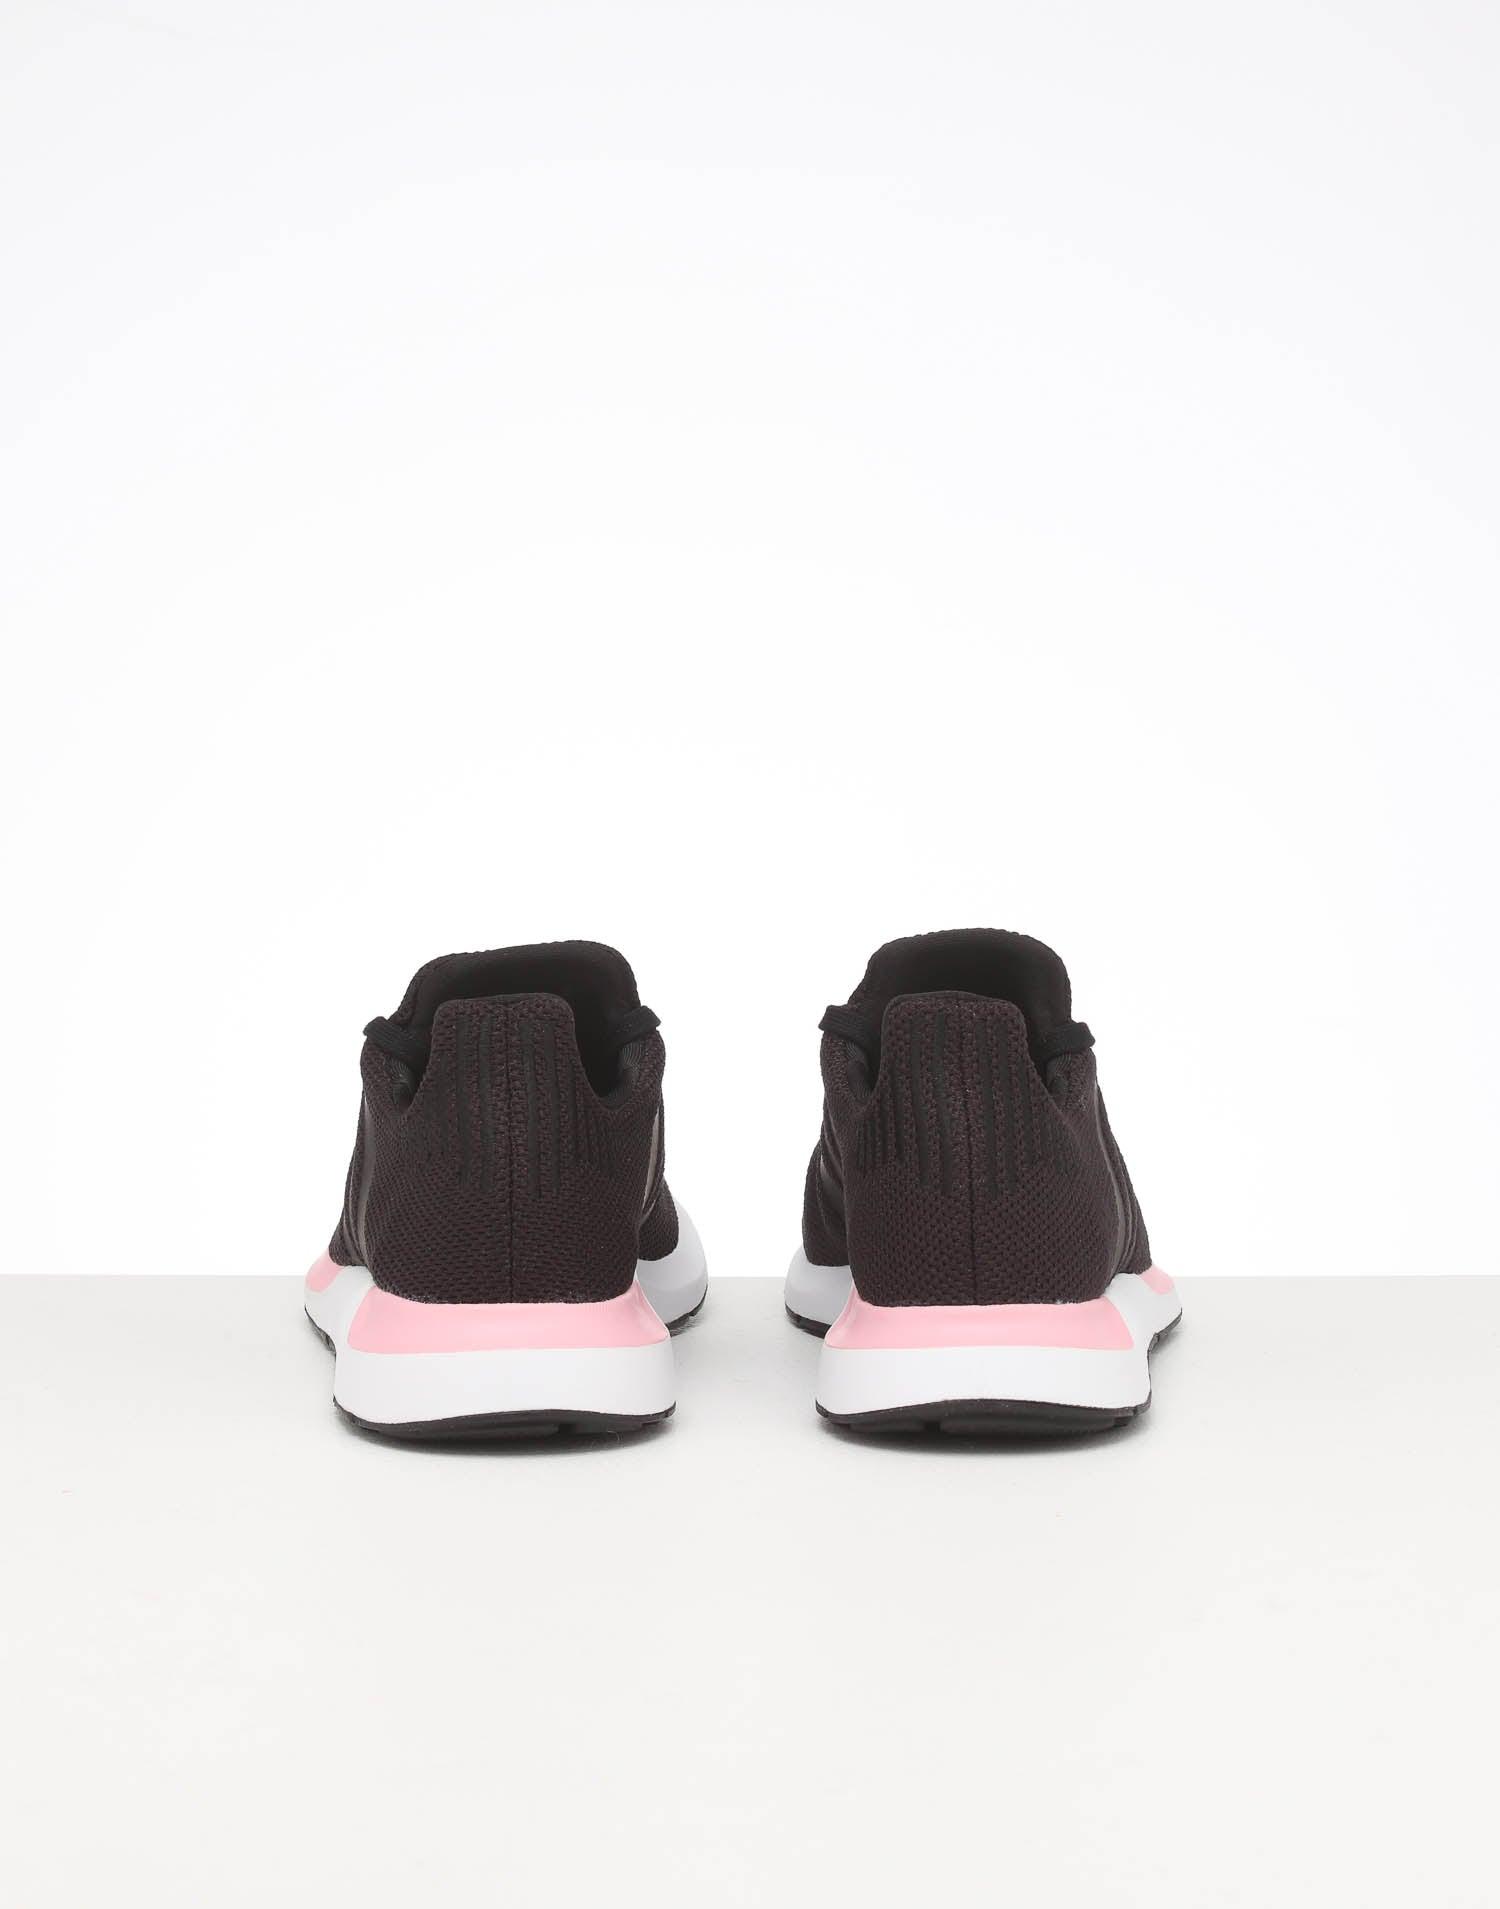 adidas swift run black pink